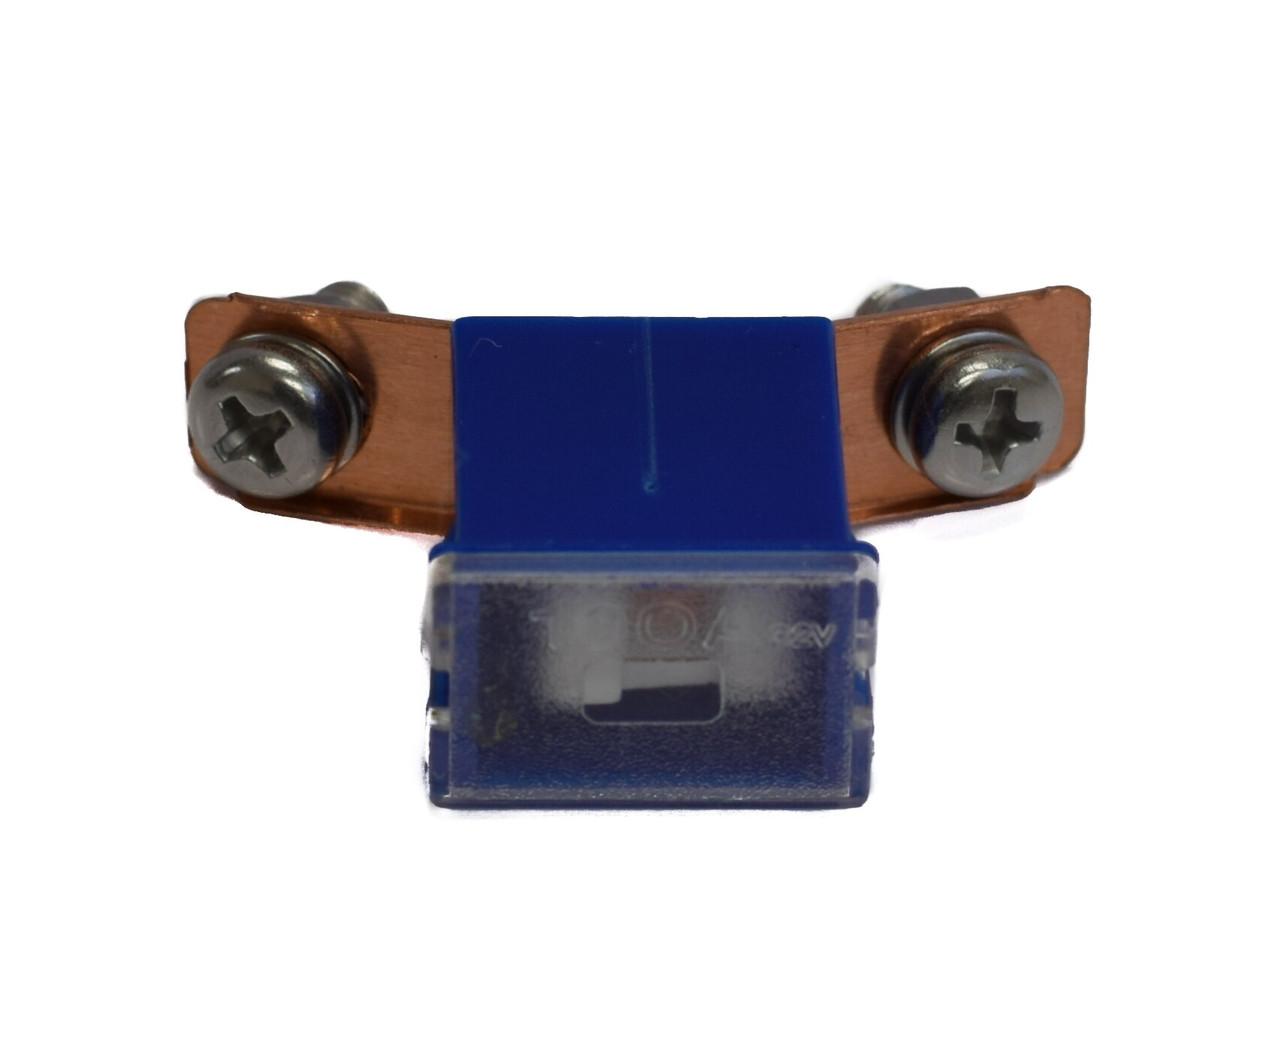 Raion Power RBC7 100A Fuse Includes Nuts & Bolts For APC SUA1500